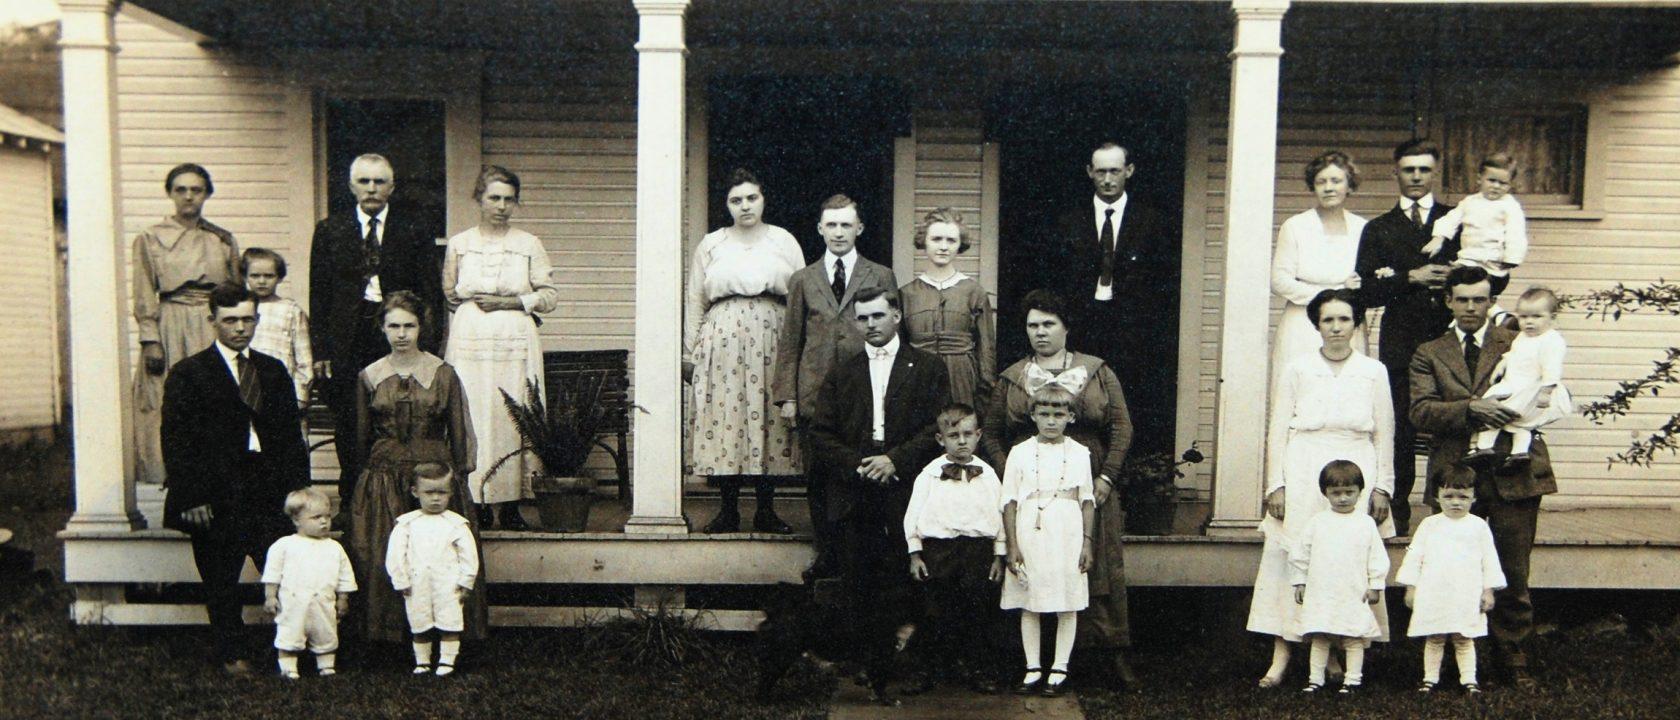 West Union West Virginia (abt) 1918 – Finley Family Reunion